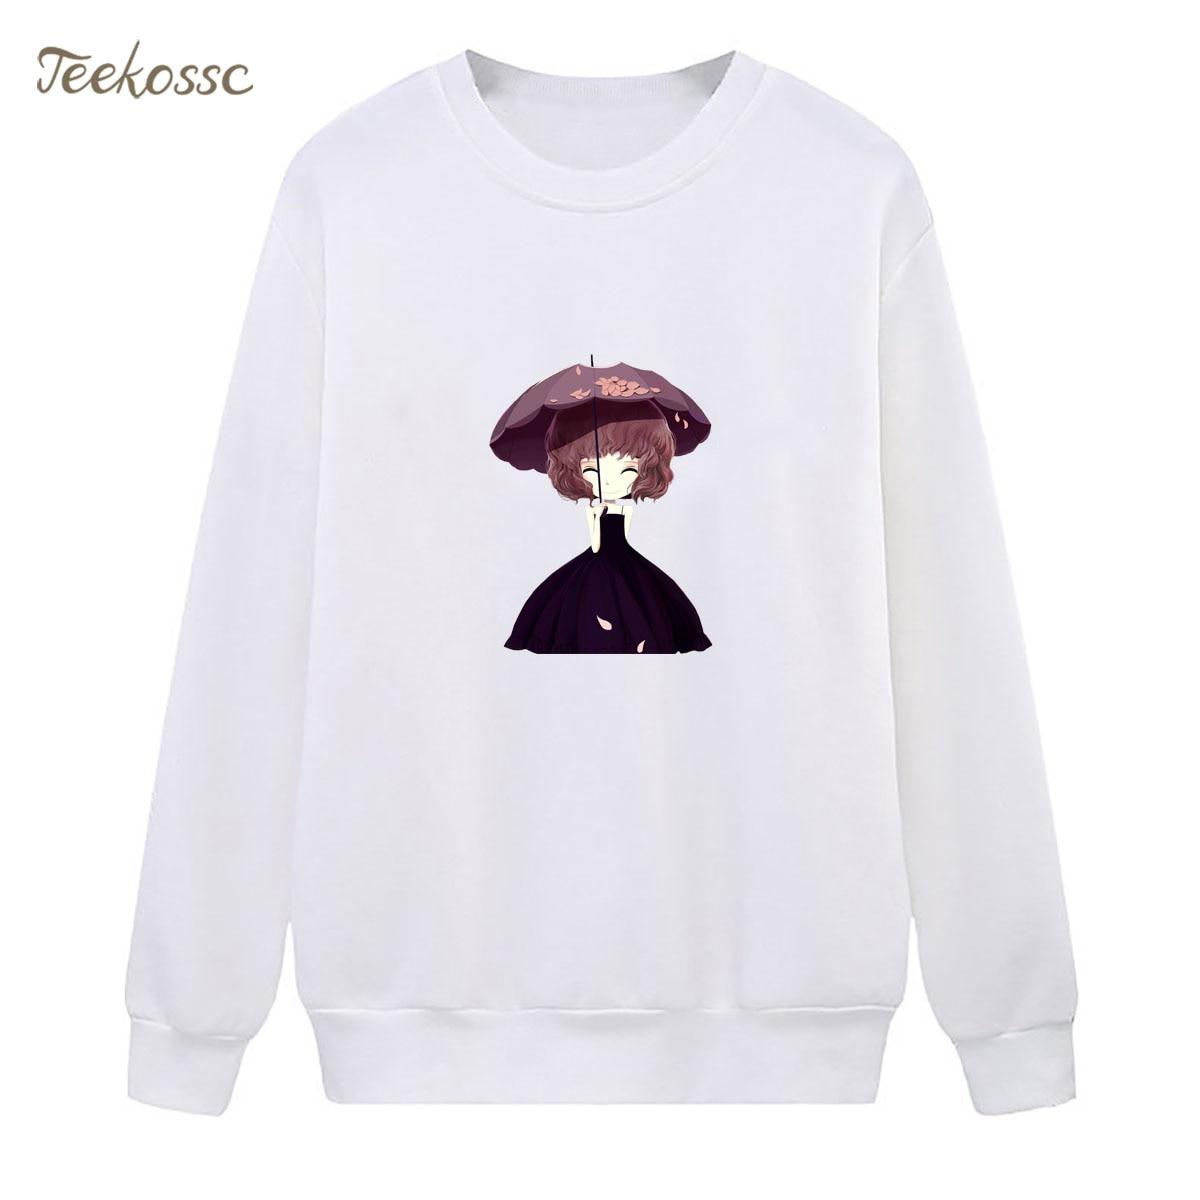 Girls Sweatshirt White Hoodie 2018 New Design Winter Autumn Women Lasdies Pullover Fleece Warm Loose Casual Hipster Streetwear